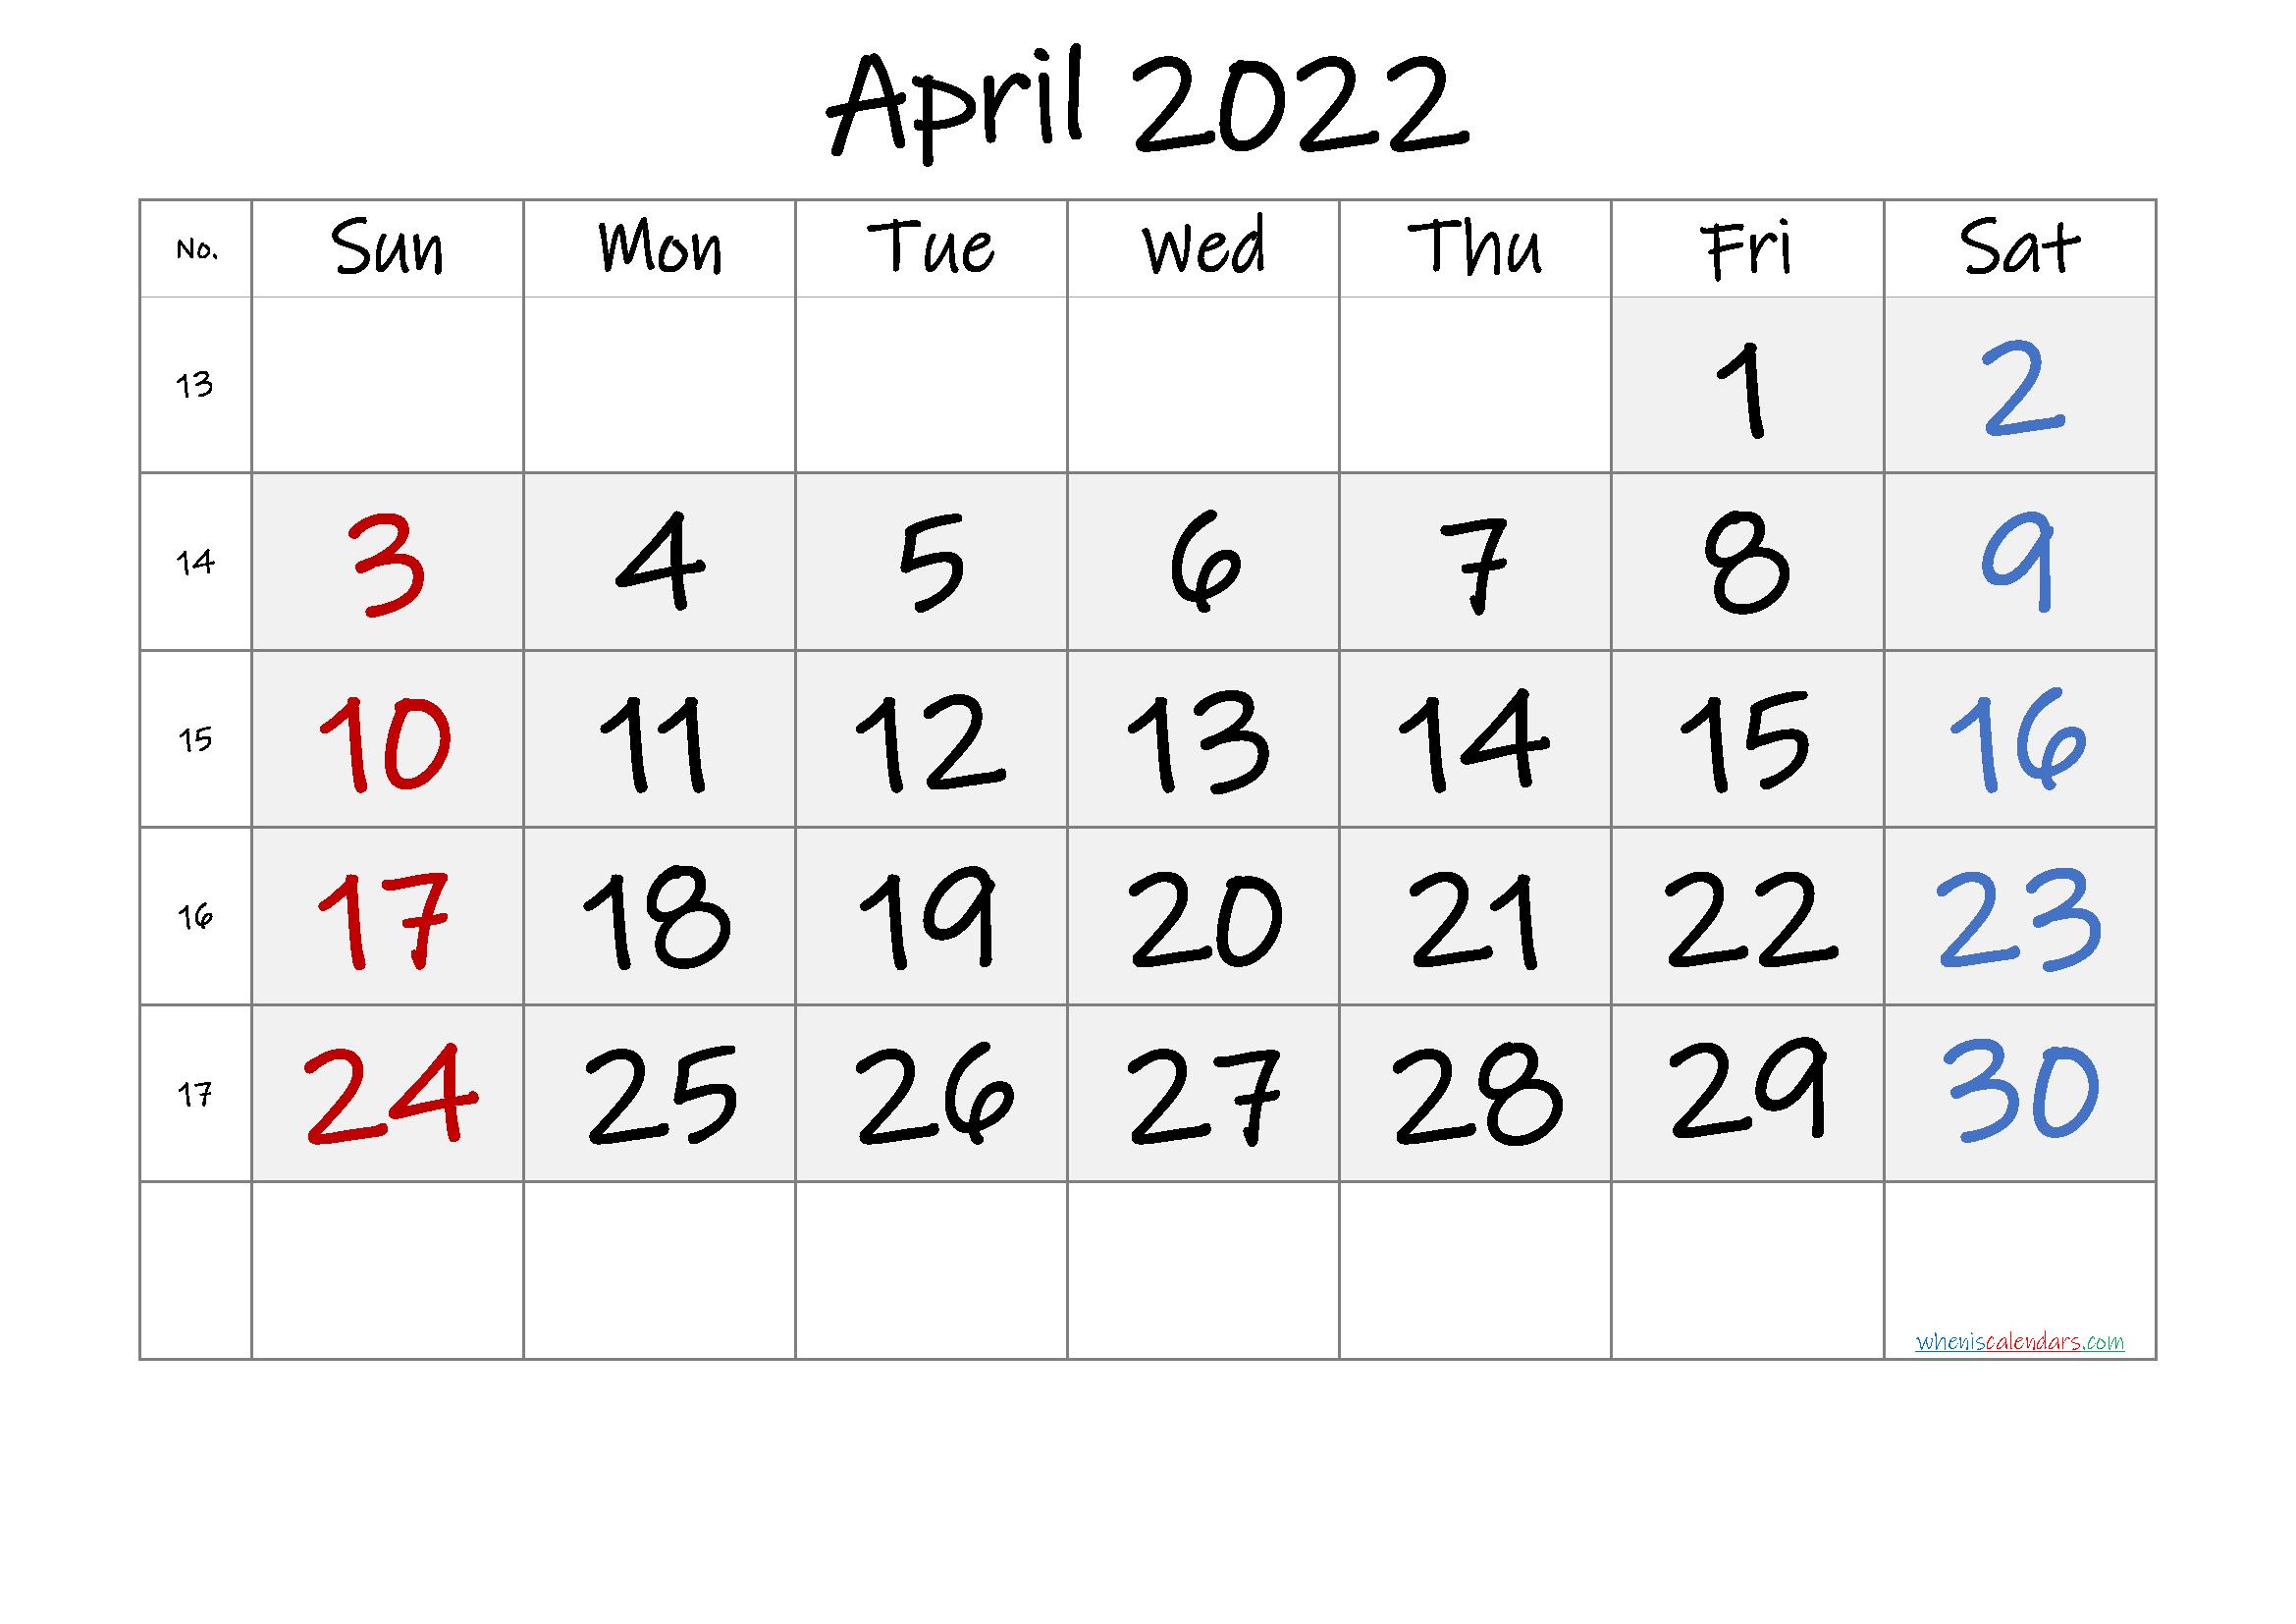 April 2022 Calendar Printable.Free Printable April 2022 Calendar 6 Templates Calendar Printables Printable Calendar Template 2021 Calendar